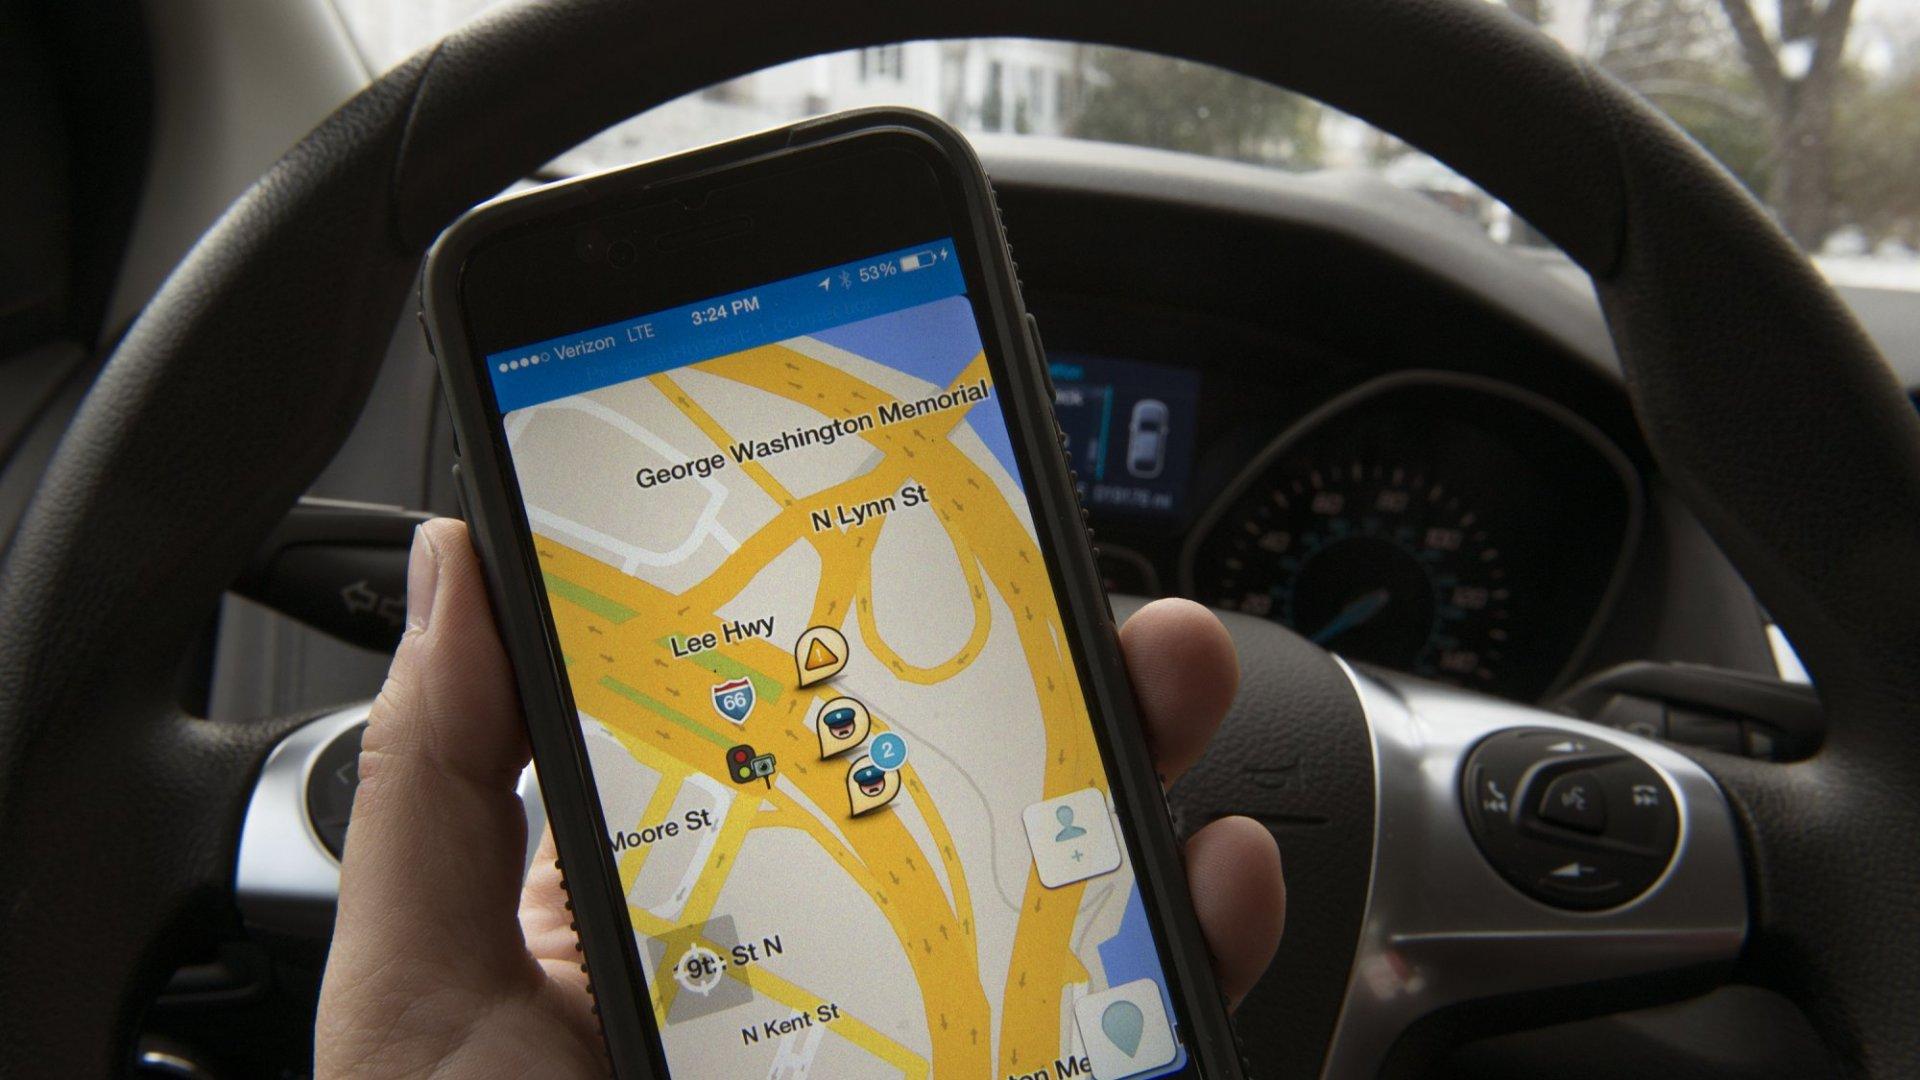 Google Expands Uber-Like Carpool Service in San Francisco